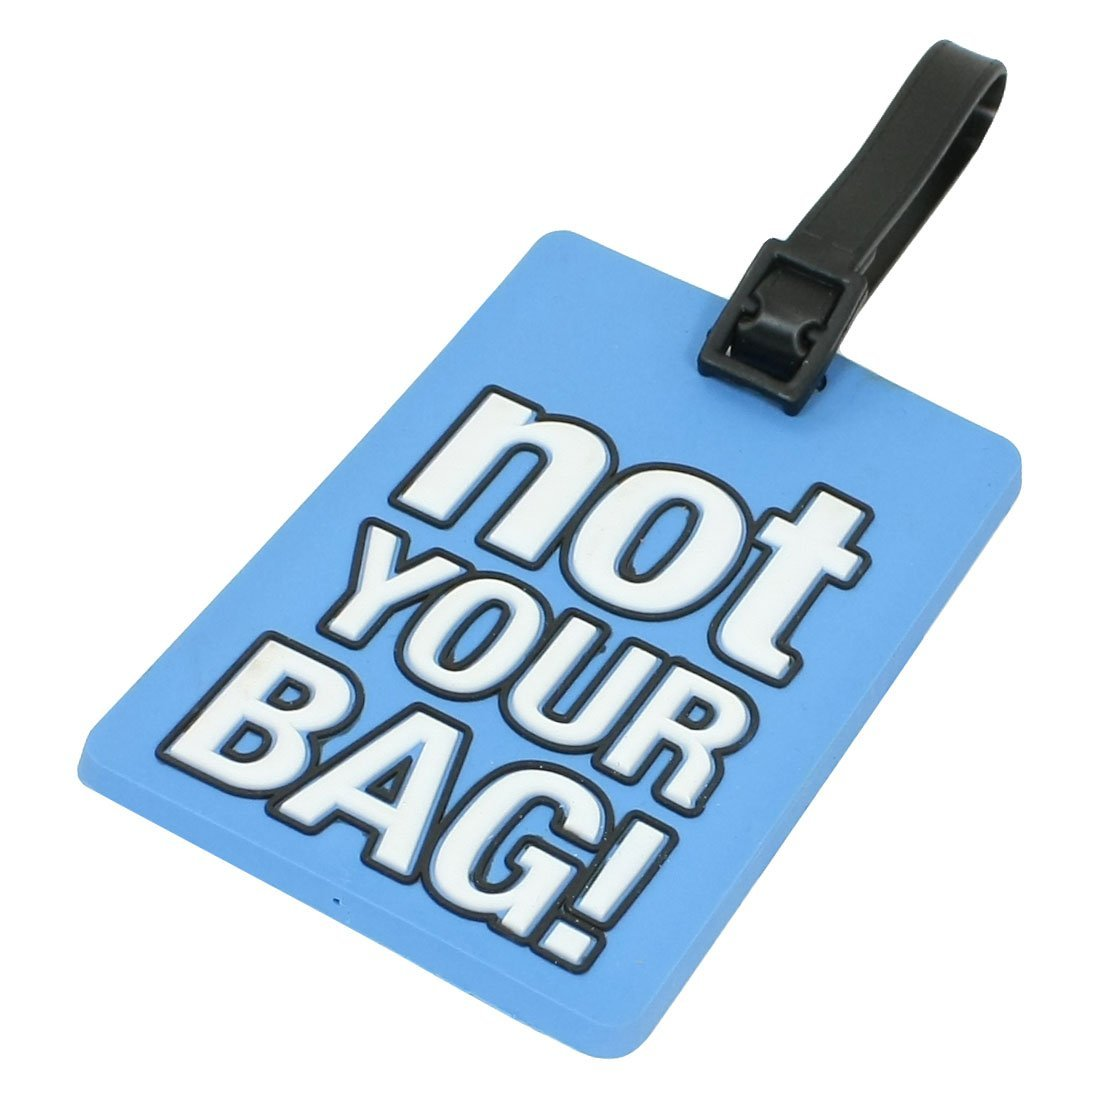 VSEN 2X Name Address Label Blue Soft Plastic Not Your Bag Pattern Luggage Tag